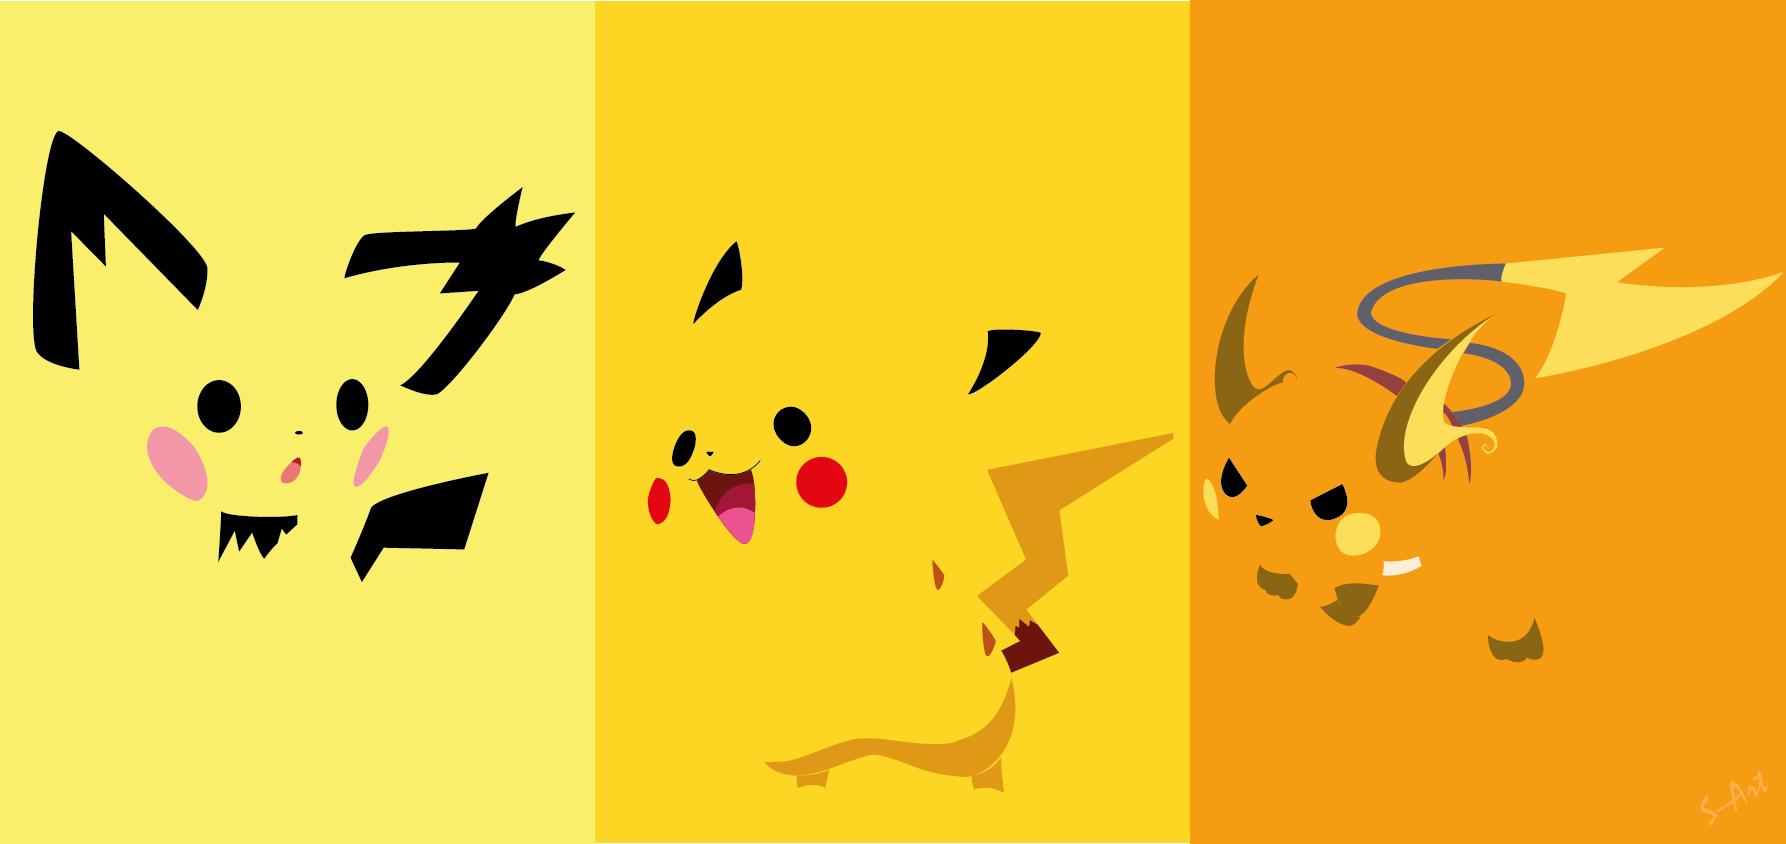 Pikachu Evolution Line By S Art On Deviantart Pikachu